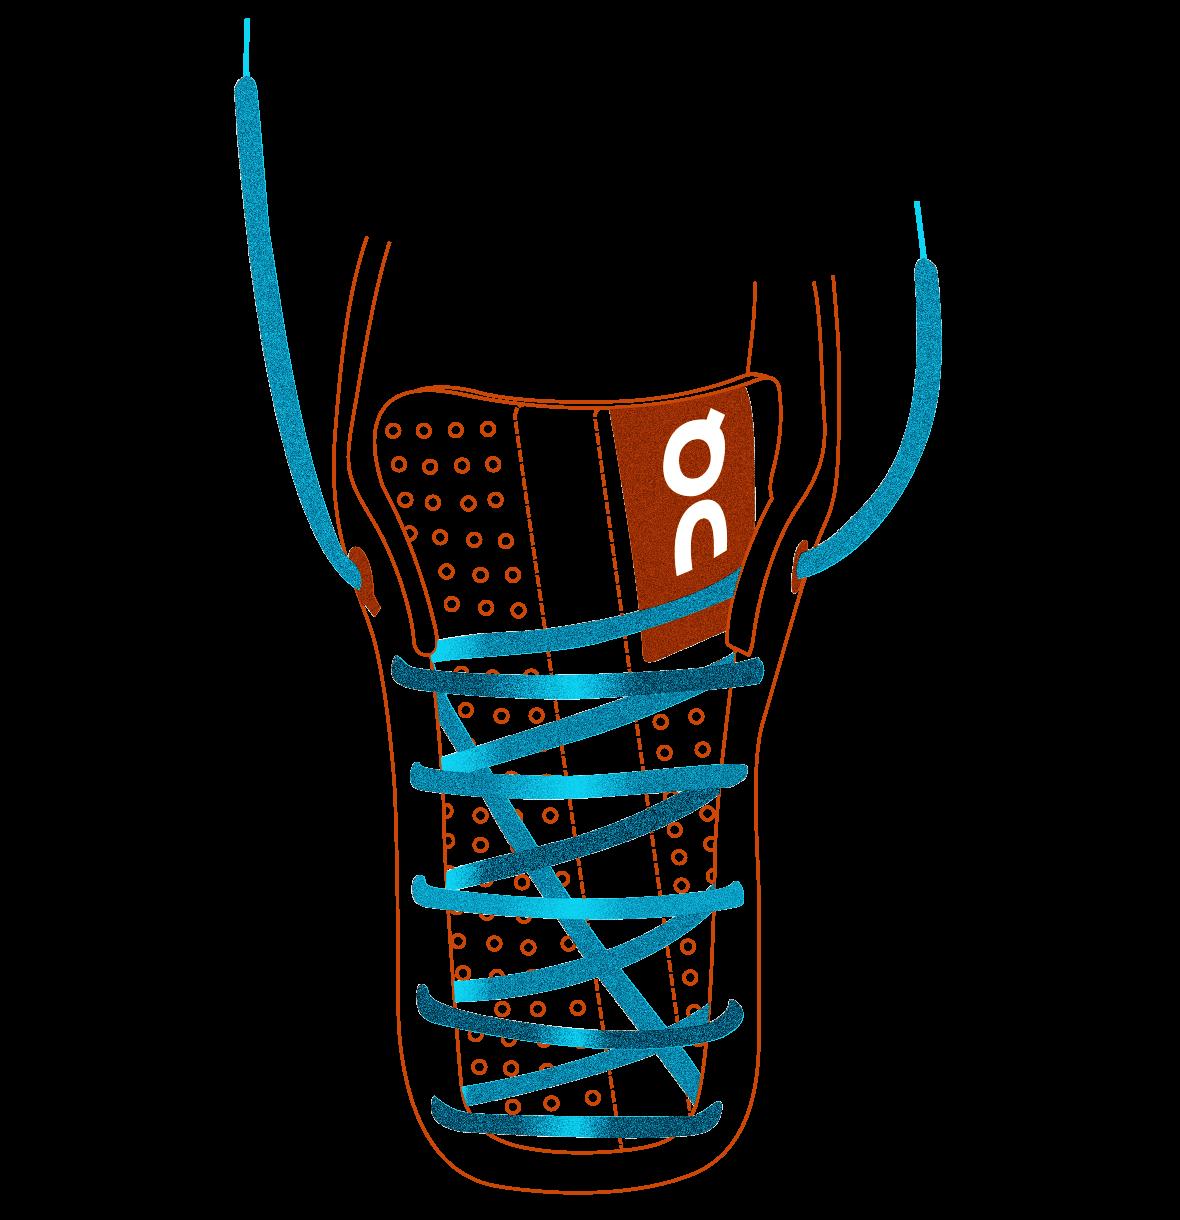 Running Shoe Lacing Techniques - breathlessrunner